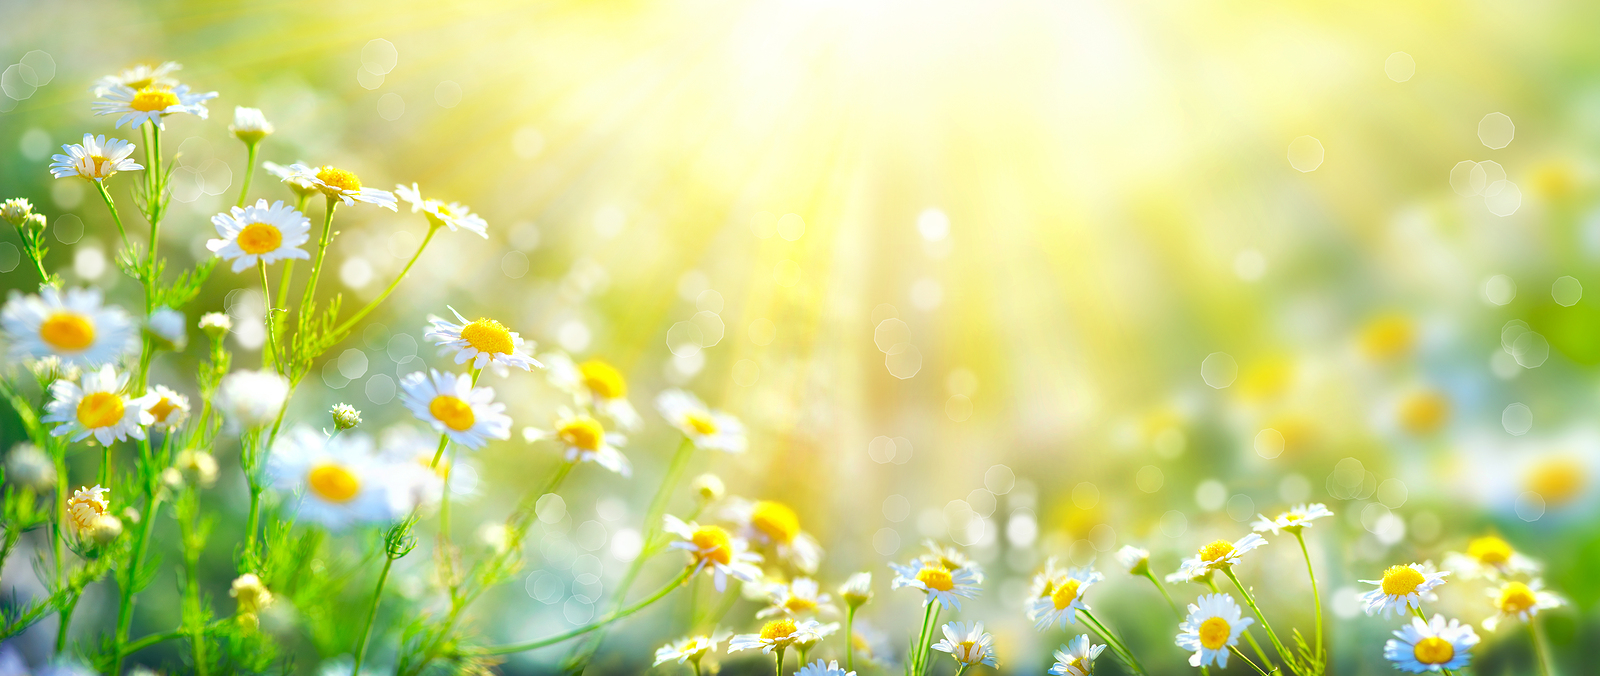 bigstock Chamomile flowers field wide b 137923193